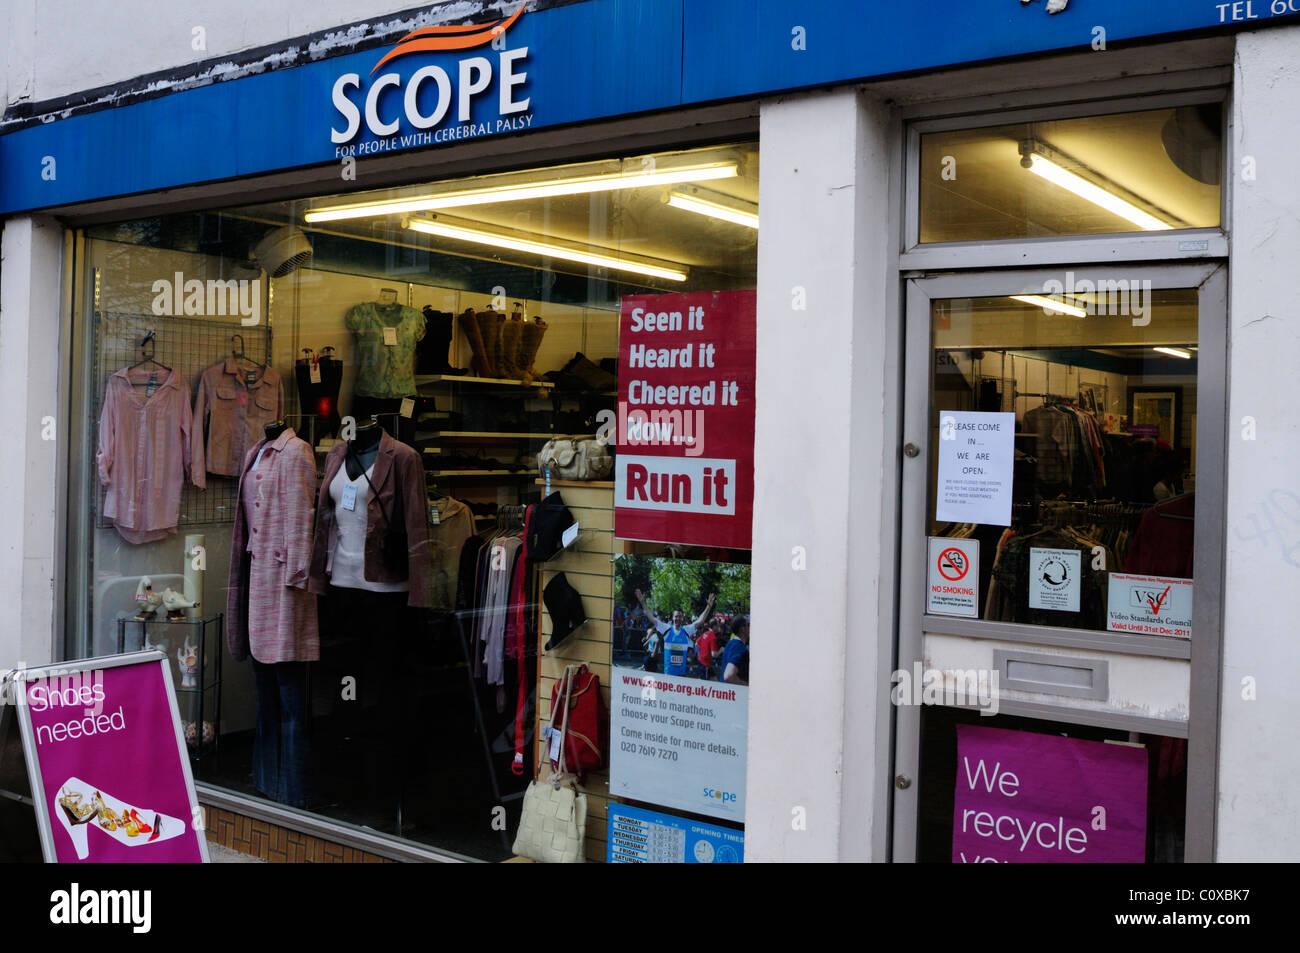 Scope Cerebal Palsy Charity Shop, Burleigh Street, Cambridge, England, UK - Stock Image